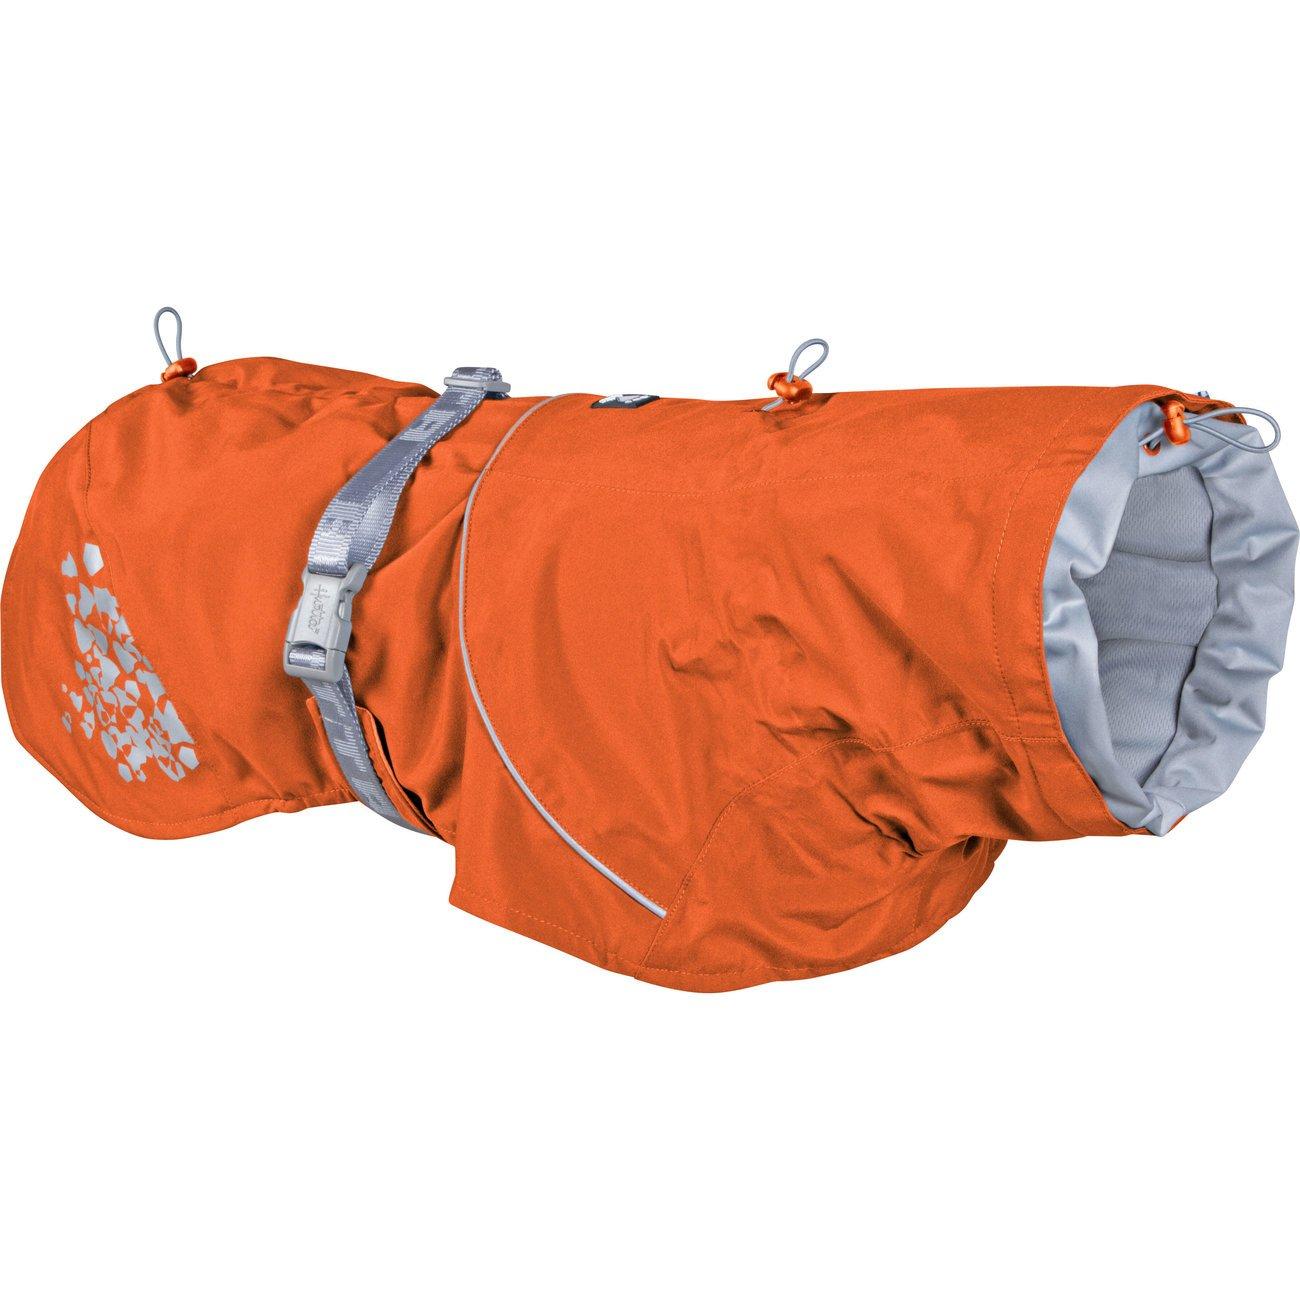 Hurtta Monsun Regenmantel, orange